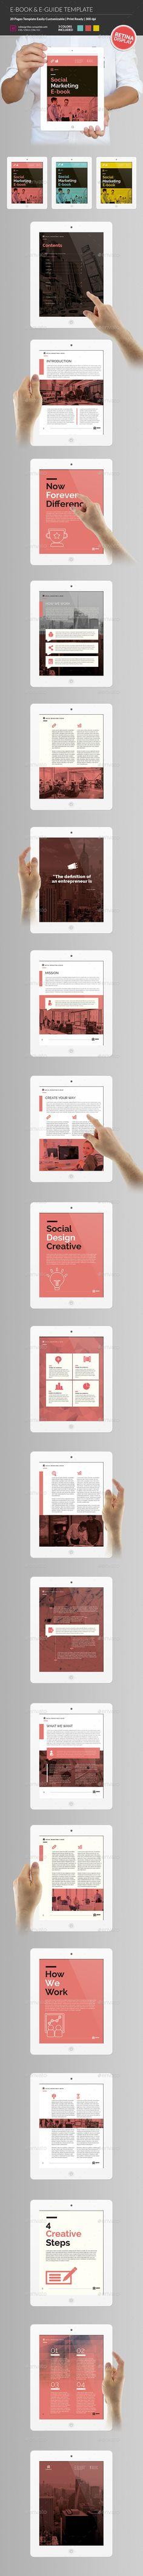 E-Book & E-Guide Template InDesign INDD. Download here: http://graphicriver.net/item/ebook-eguide/15930180?ref=ksioks